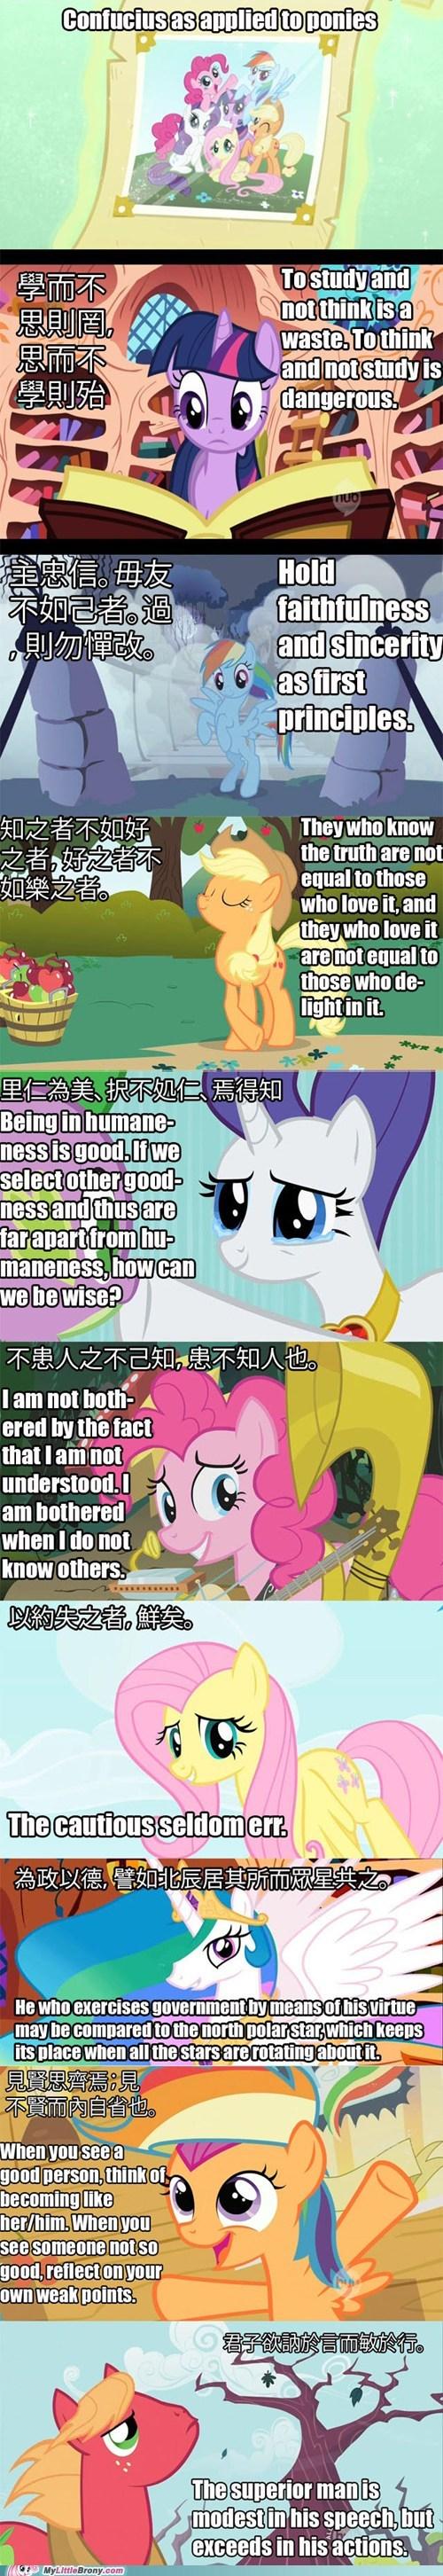 Confucian Ponies